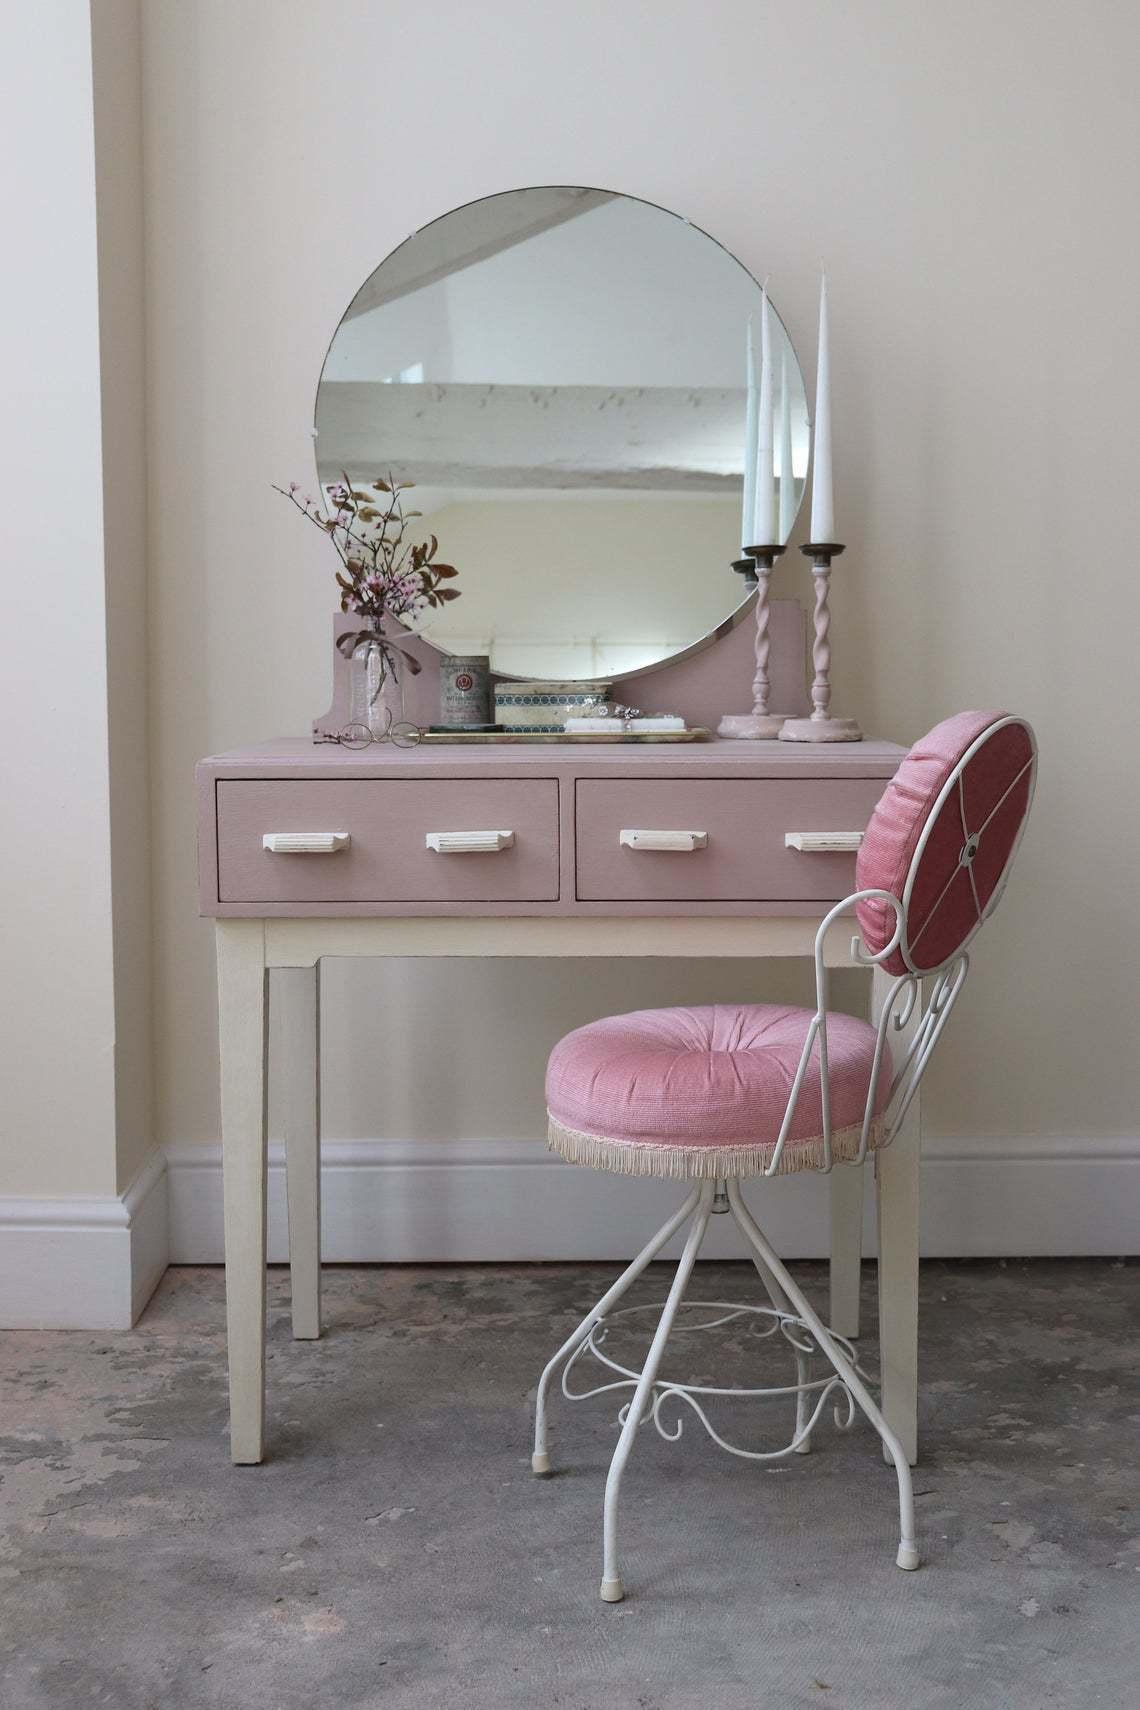 60s Boudoir Style Dressing Table Chair